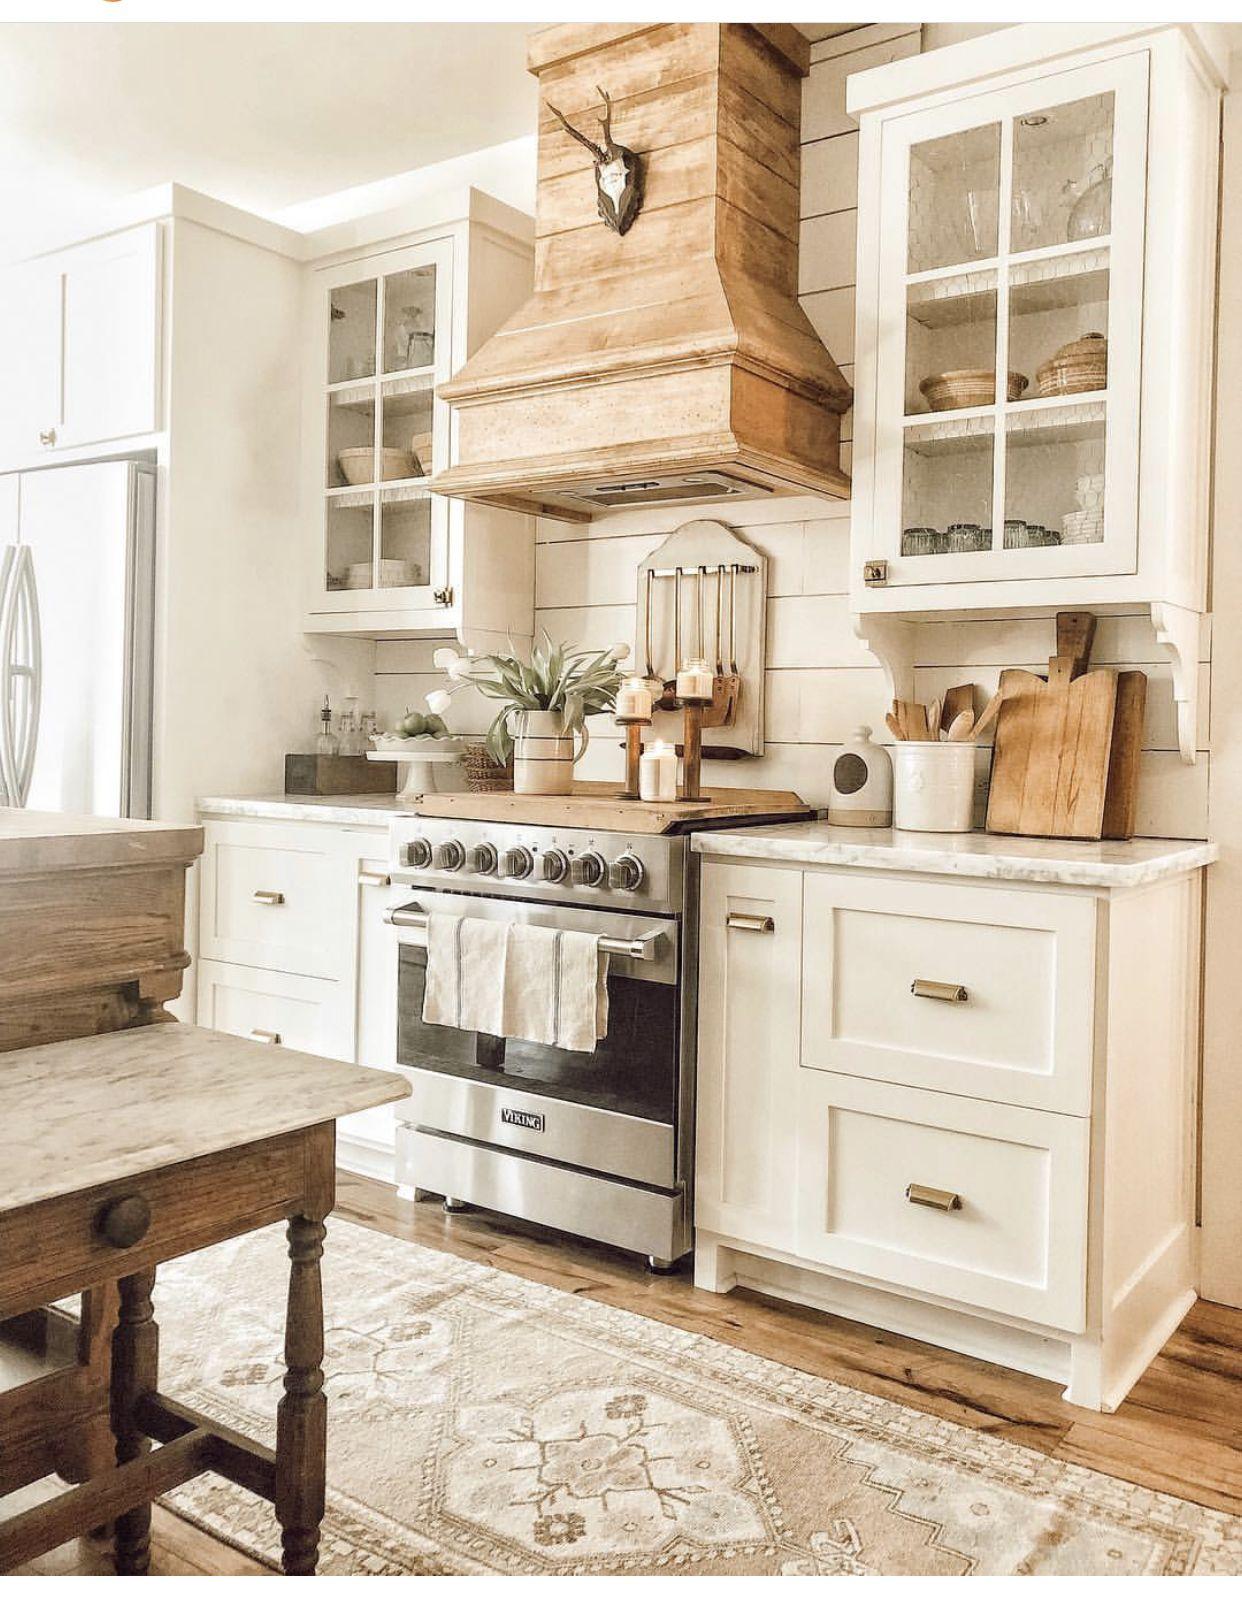 Love This Natural Wood Stove Hood Kitchendesign Kitchenideas Rustic Kitchen Cabinets Rustic Kitchen Home Kitchens